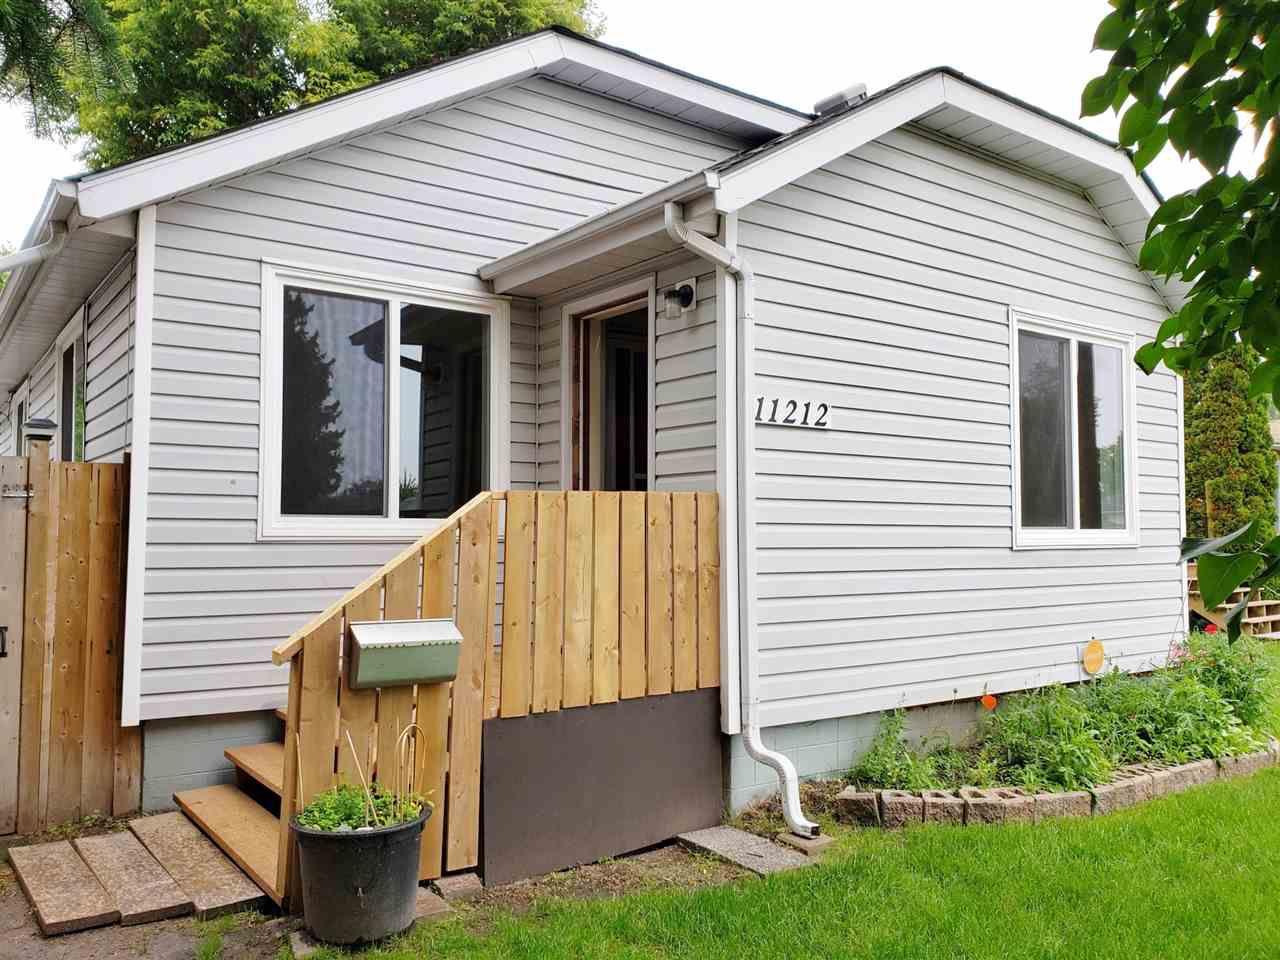 Main Photo: 11212 50 Street in Edmonton: Zone 09 House for sale : MLS®# E4164157